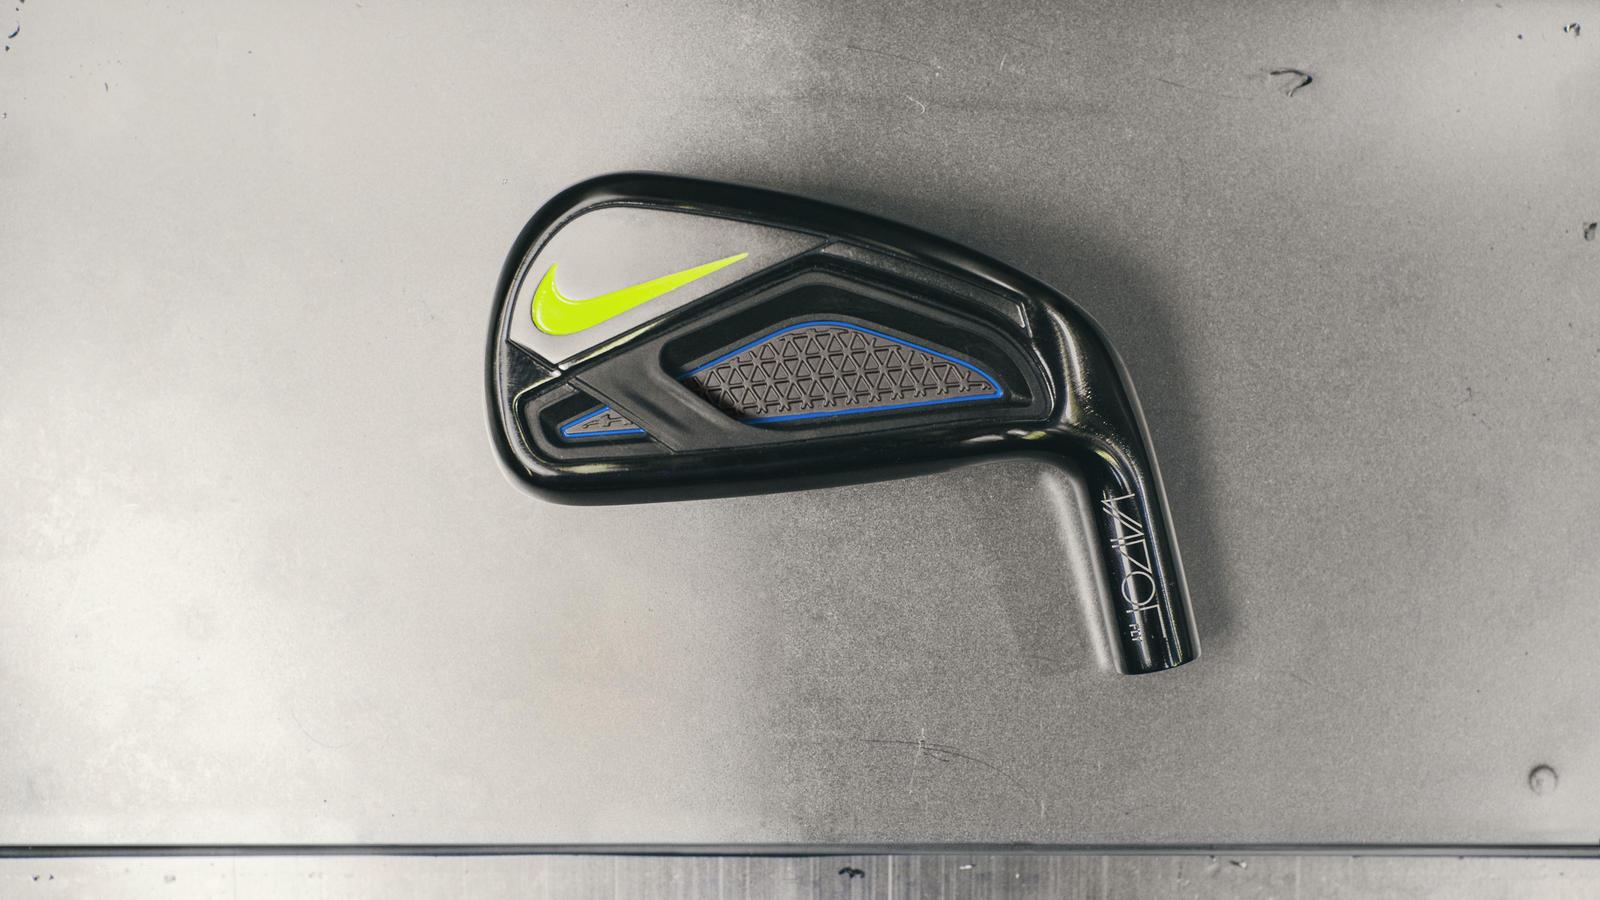 01ec9e76c13bf Nike Vapor Fly Irons